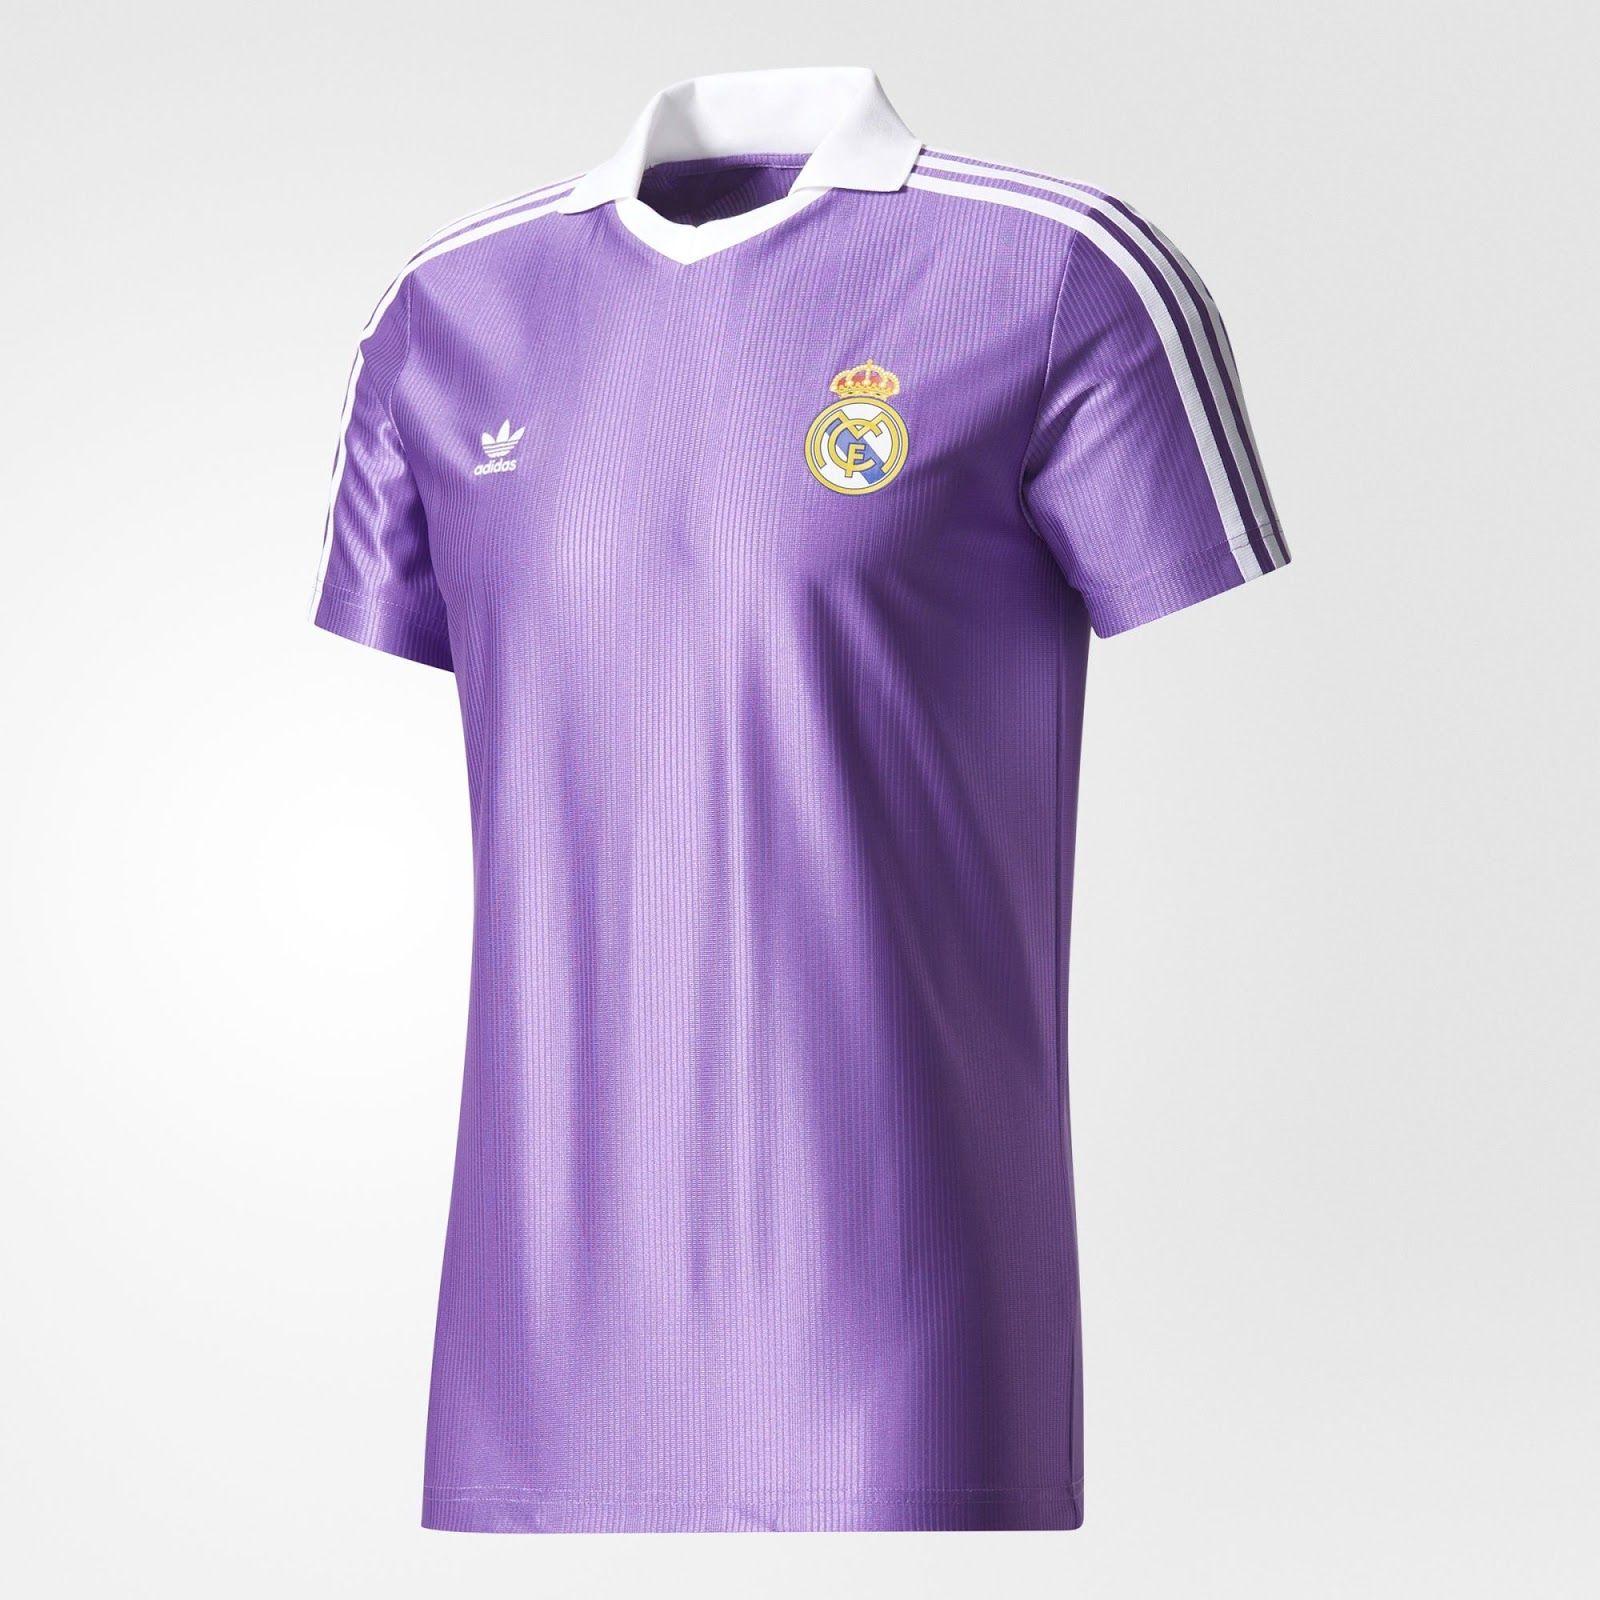 Real Madrid Blue Jersey Real Madrid Blue Jersey Real Madrid Sports Shirts